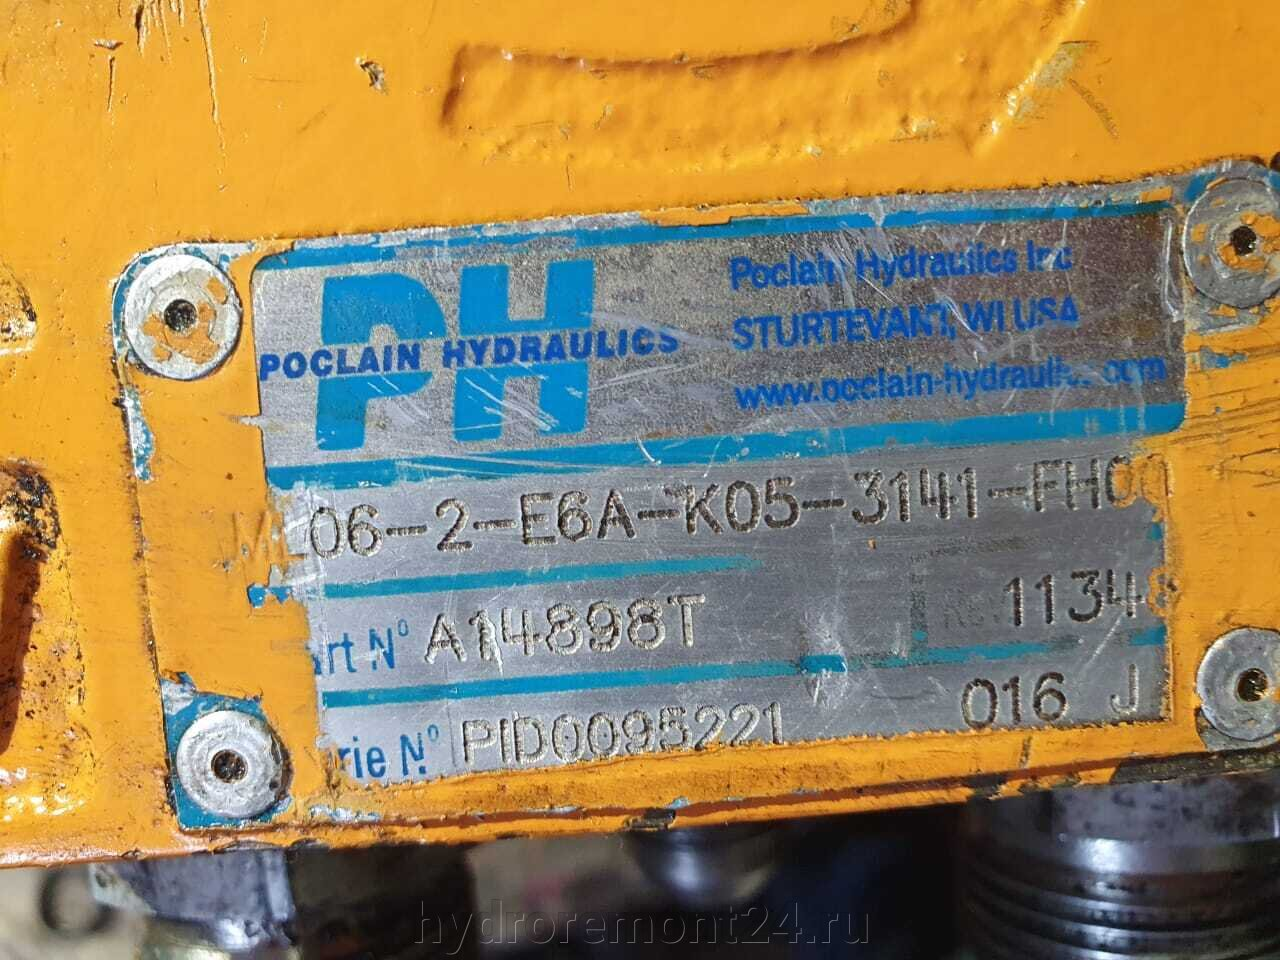 Гидромоторы Poclain - фото pic_65486ca655733e140834c826778790fc_1920x9000_1.jpg